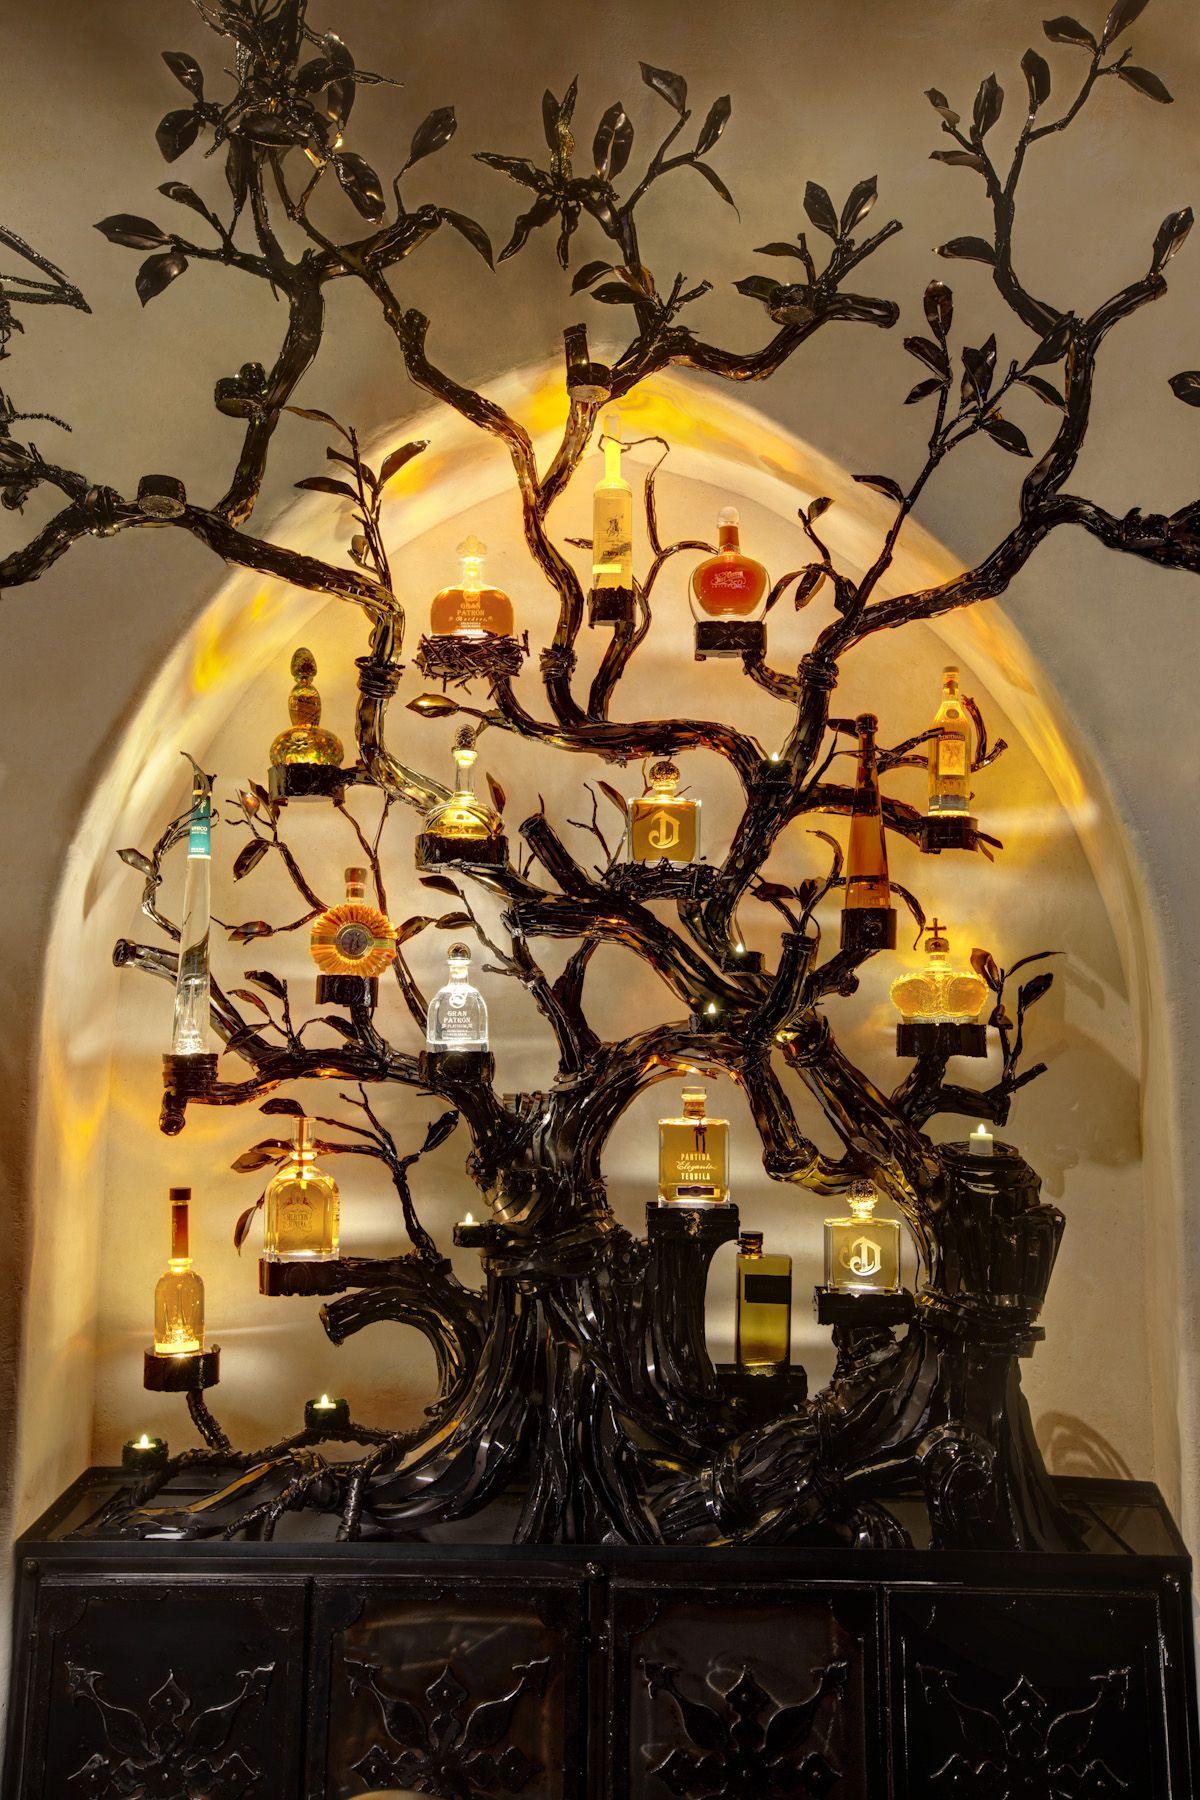 petermax co — javier's - aria hotel & casino tequila tree metal